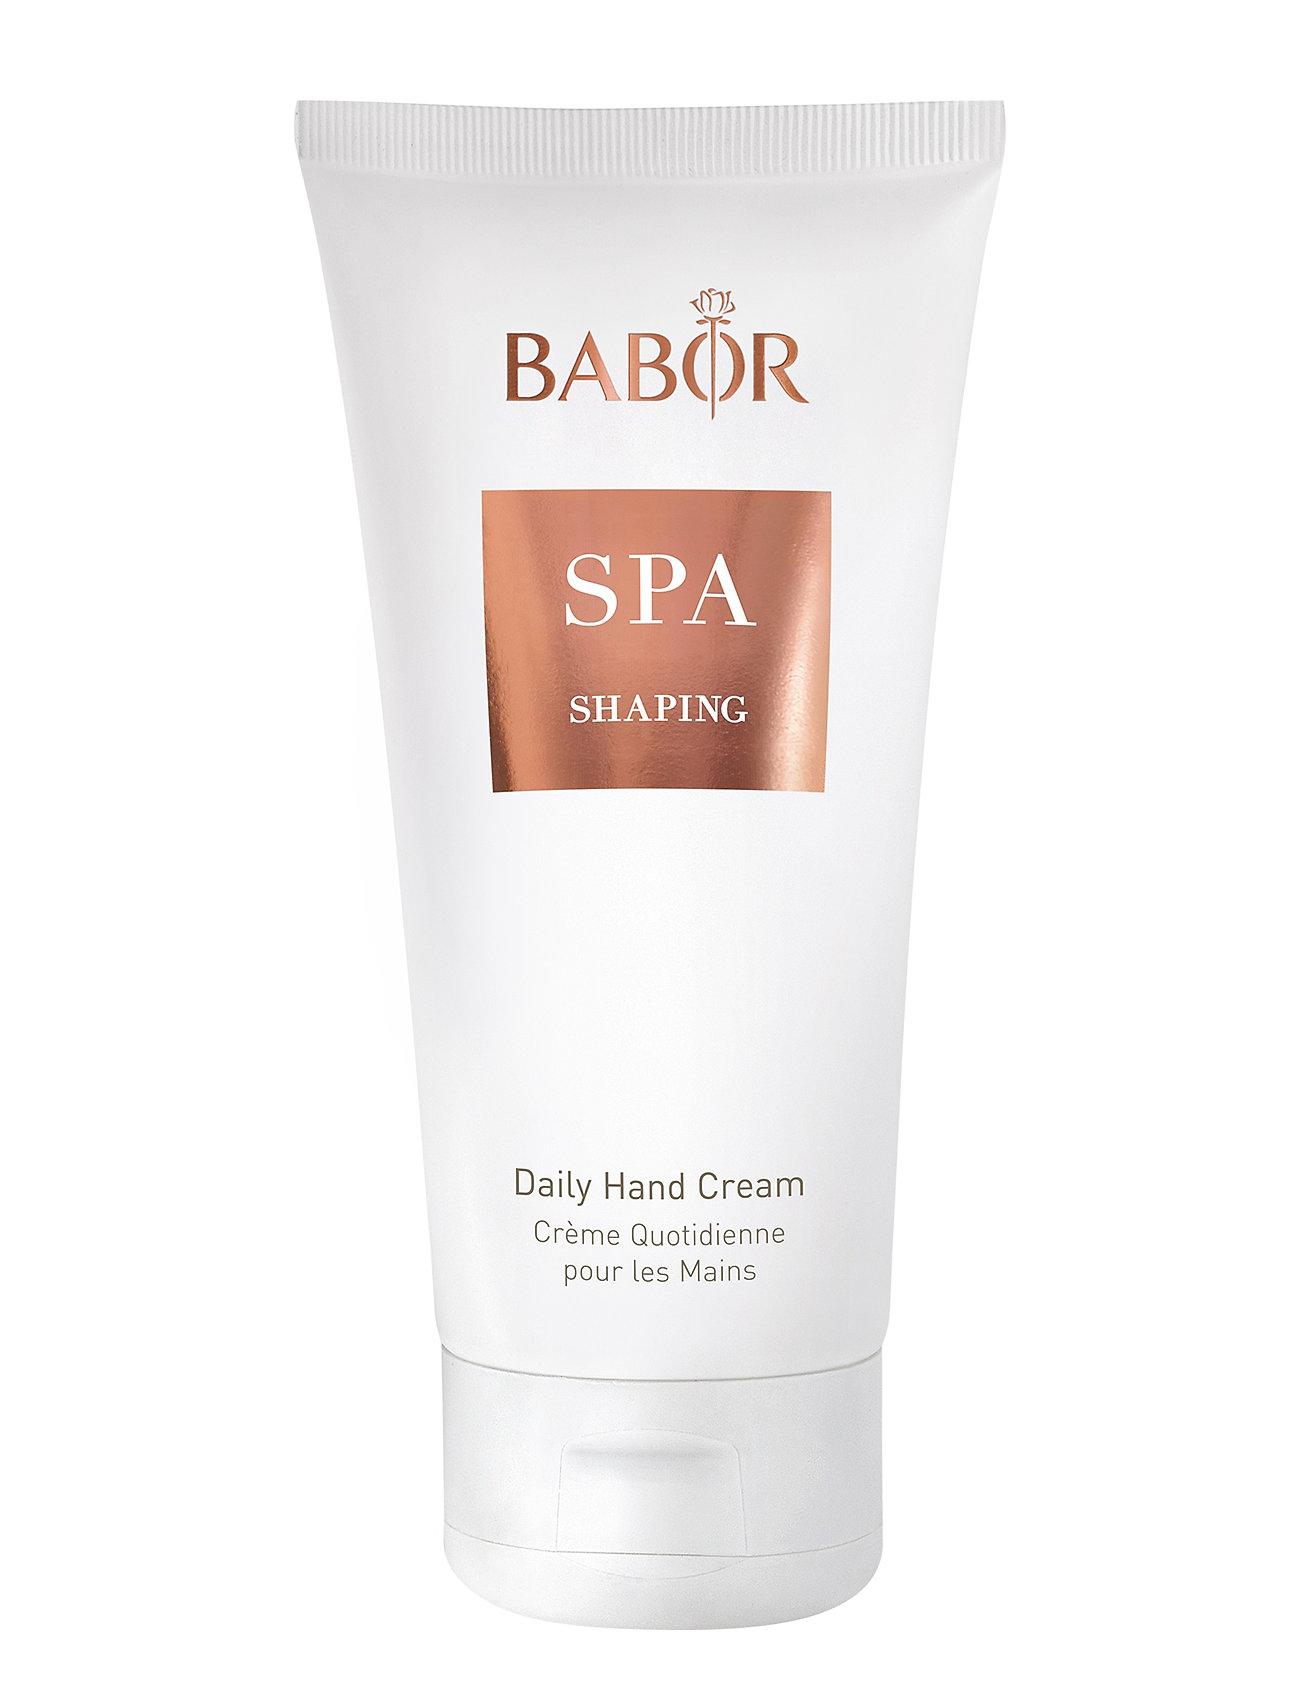 Image of Shaping Daily Hand Cream Beauty WOMEN Skin Care Body Hand Cream & Foot Cream Nude Babor (3223838913)